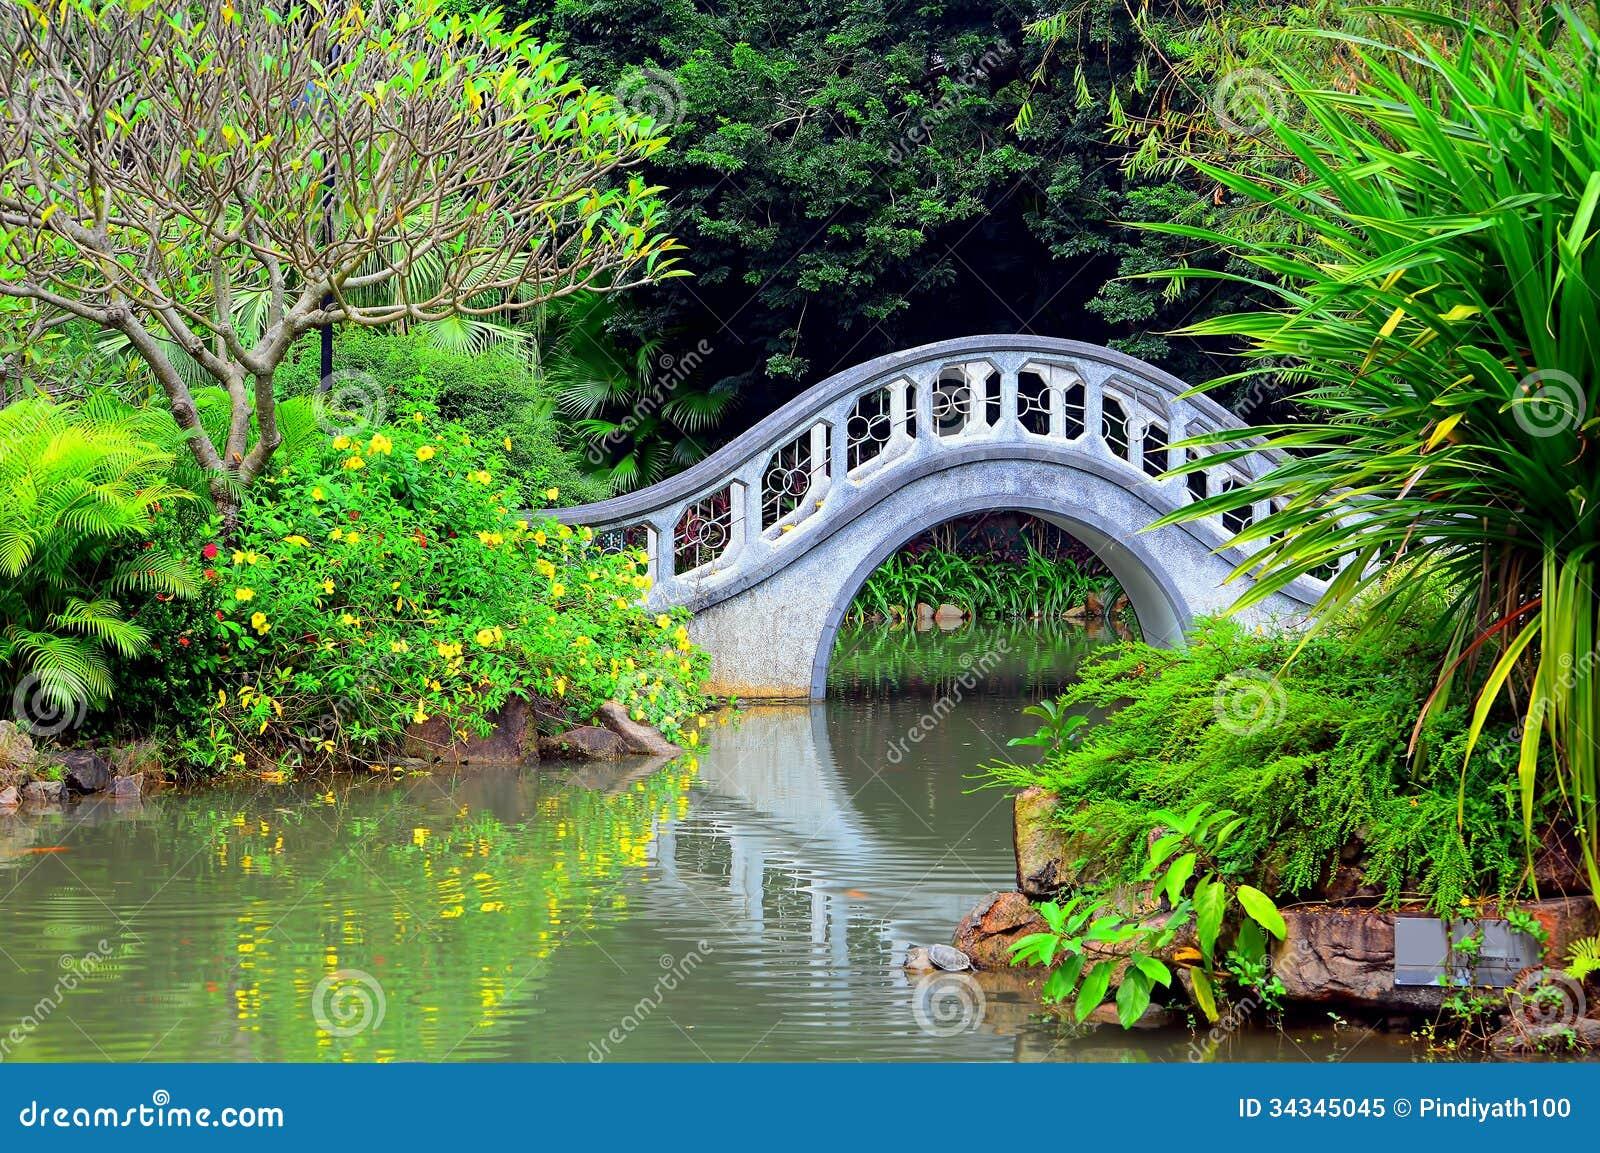 Zen Garden Photography Zen garden with arch shapeZen Garden Photography